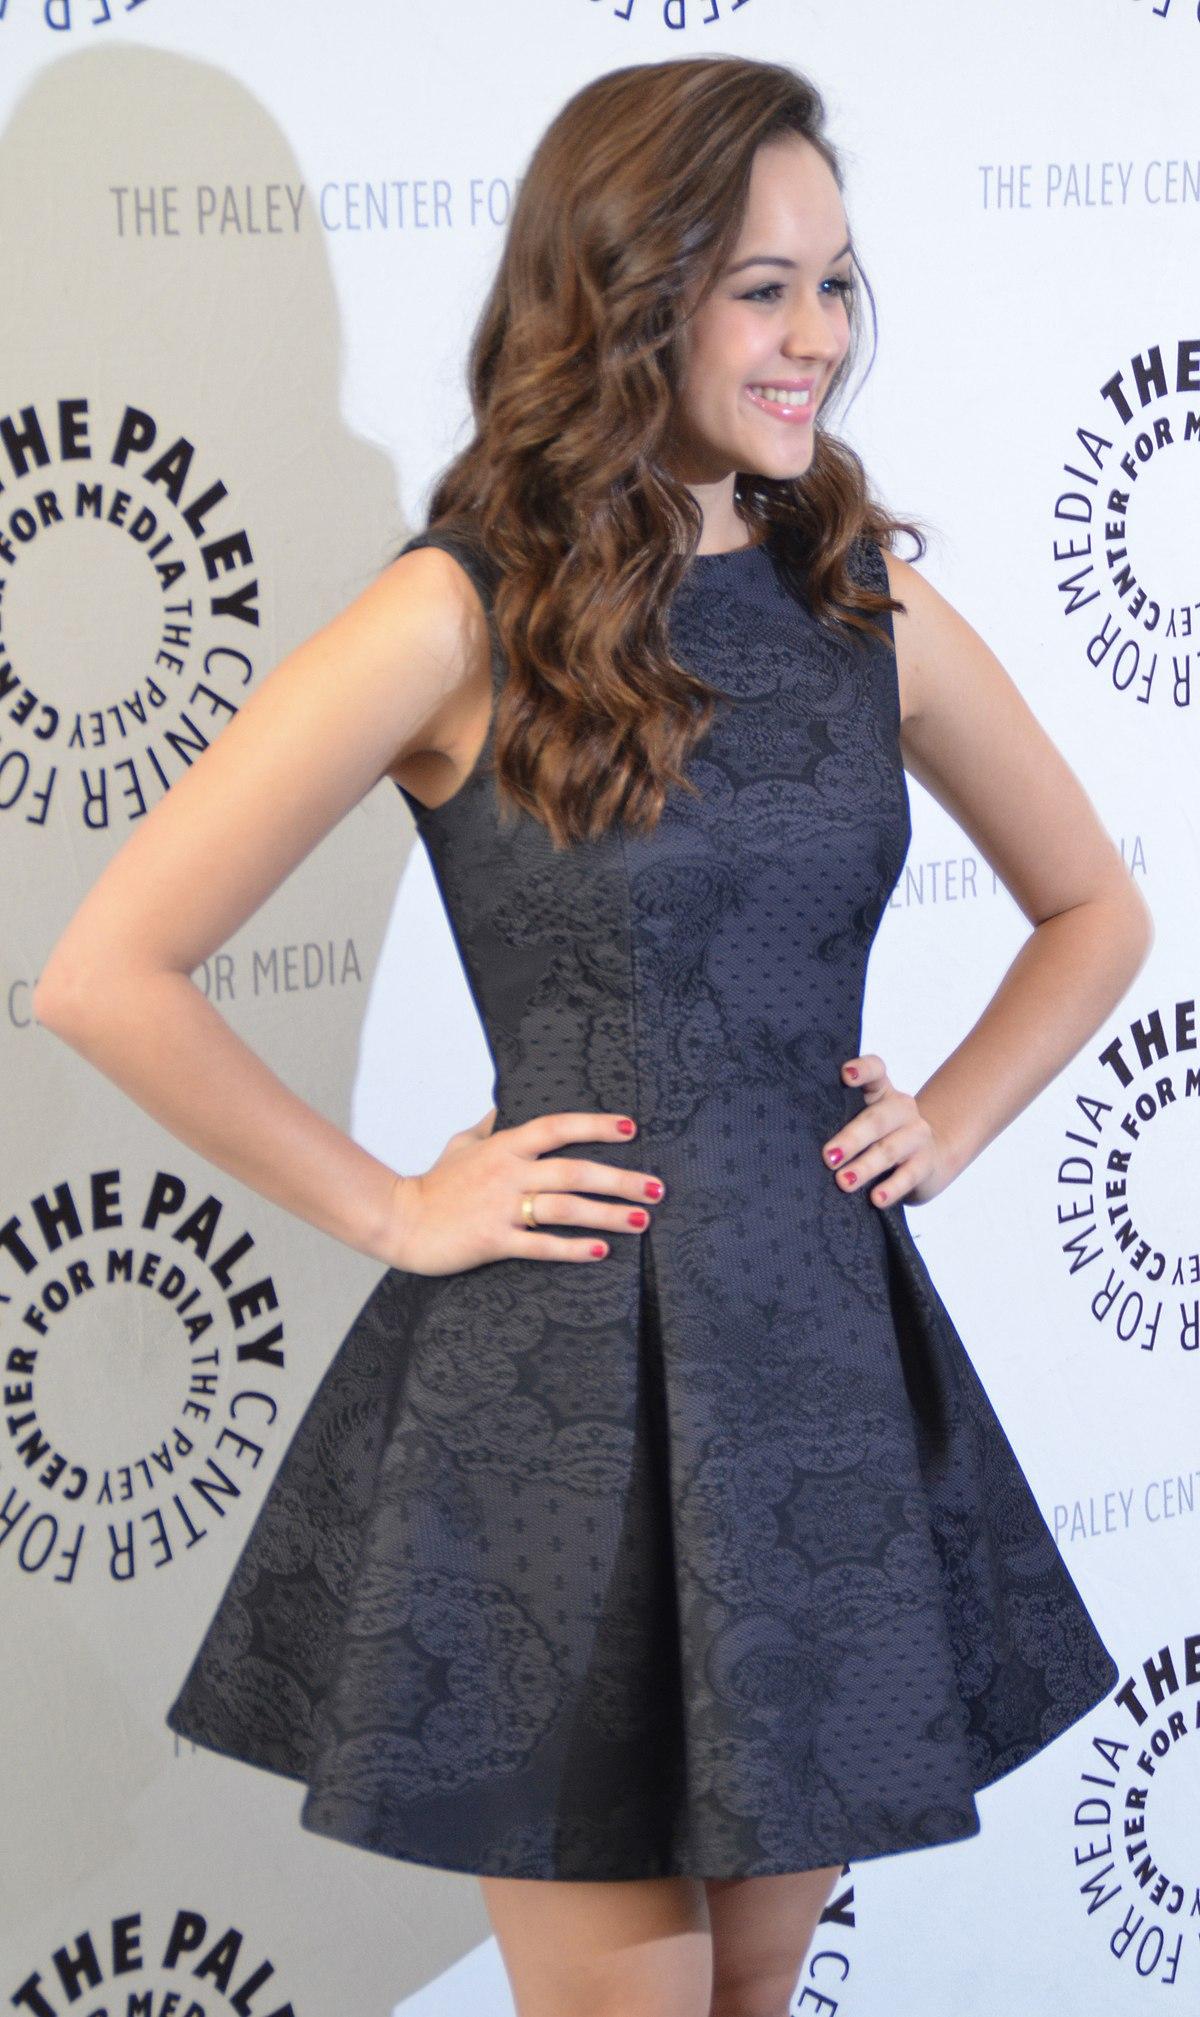 Hayley Orrantia - Wikipedia